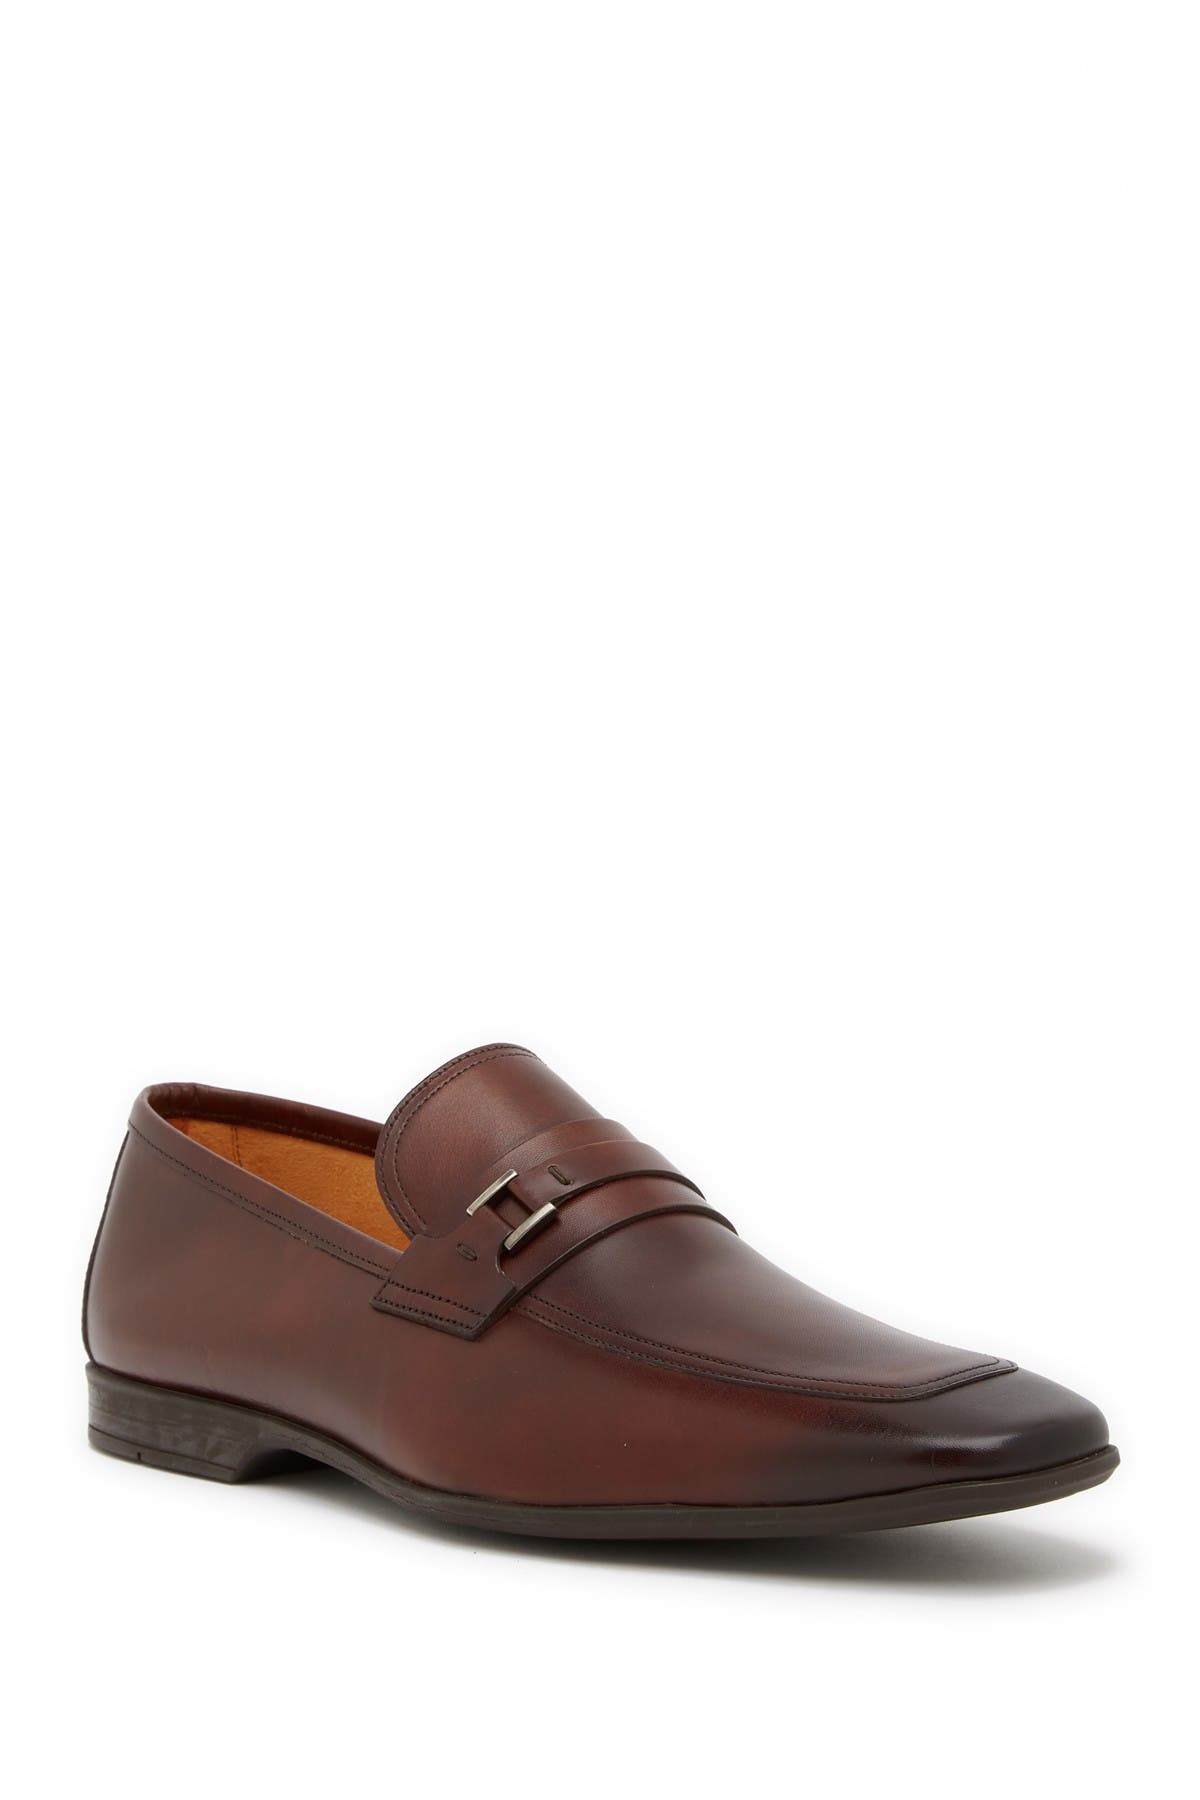 Magnanni   Meingo Bit Leather Loafer